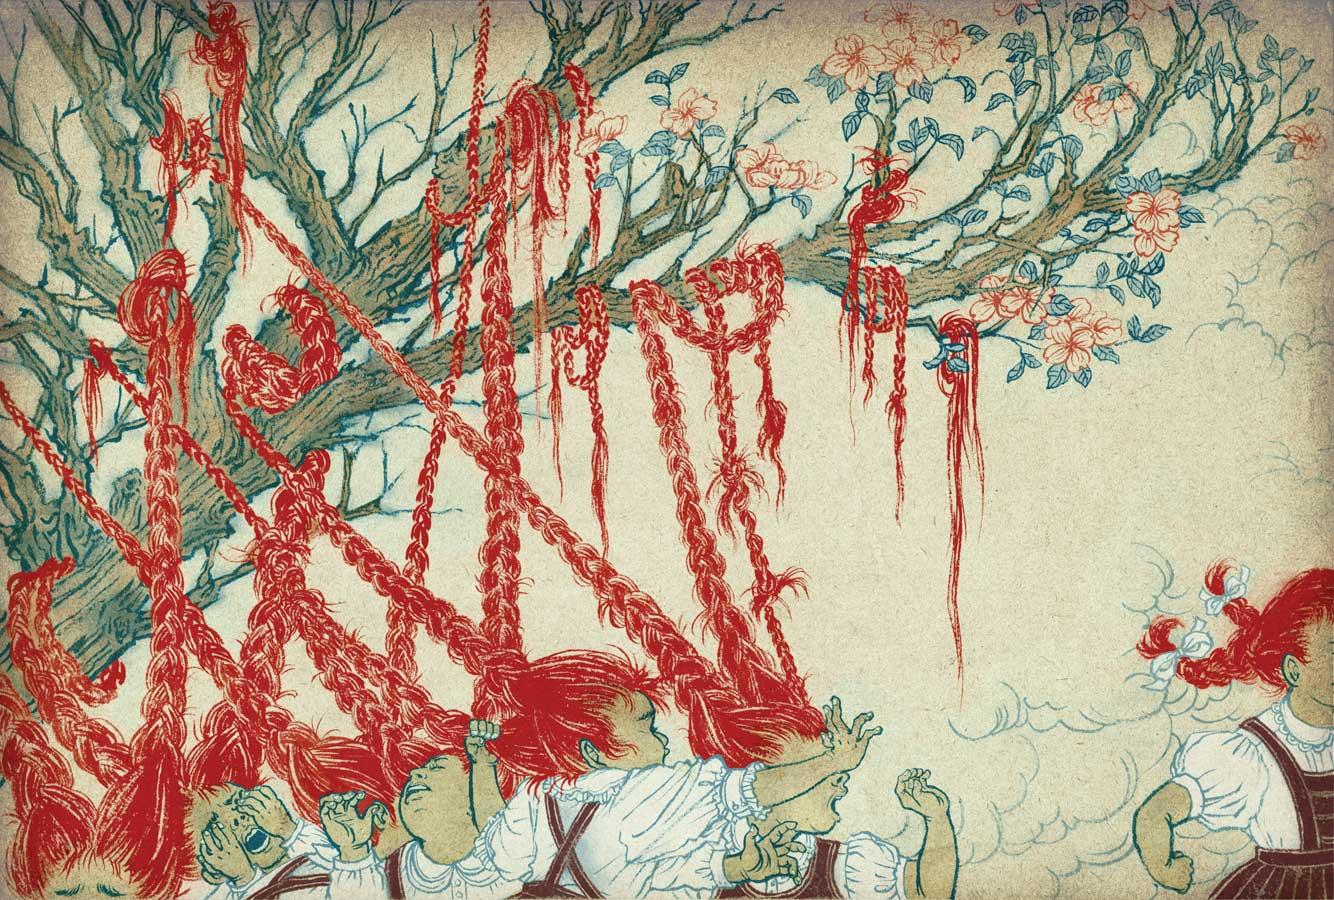 https://i1.wp.com/yukoart.com/wp-content/uploads/2013/04/hair_tree_ai_cio_yuko_shimizu.jpg